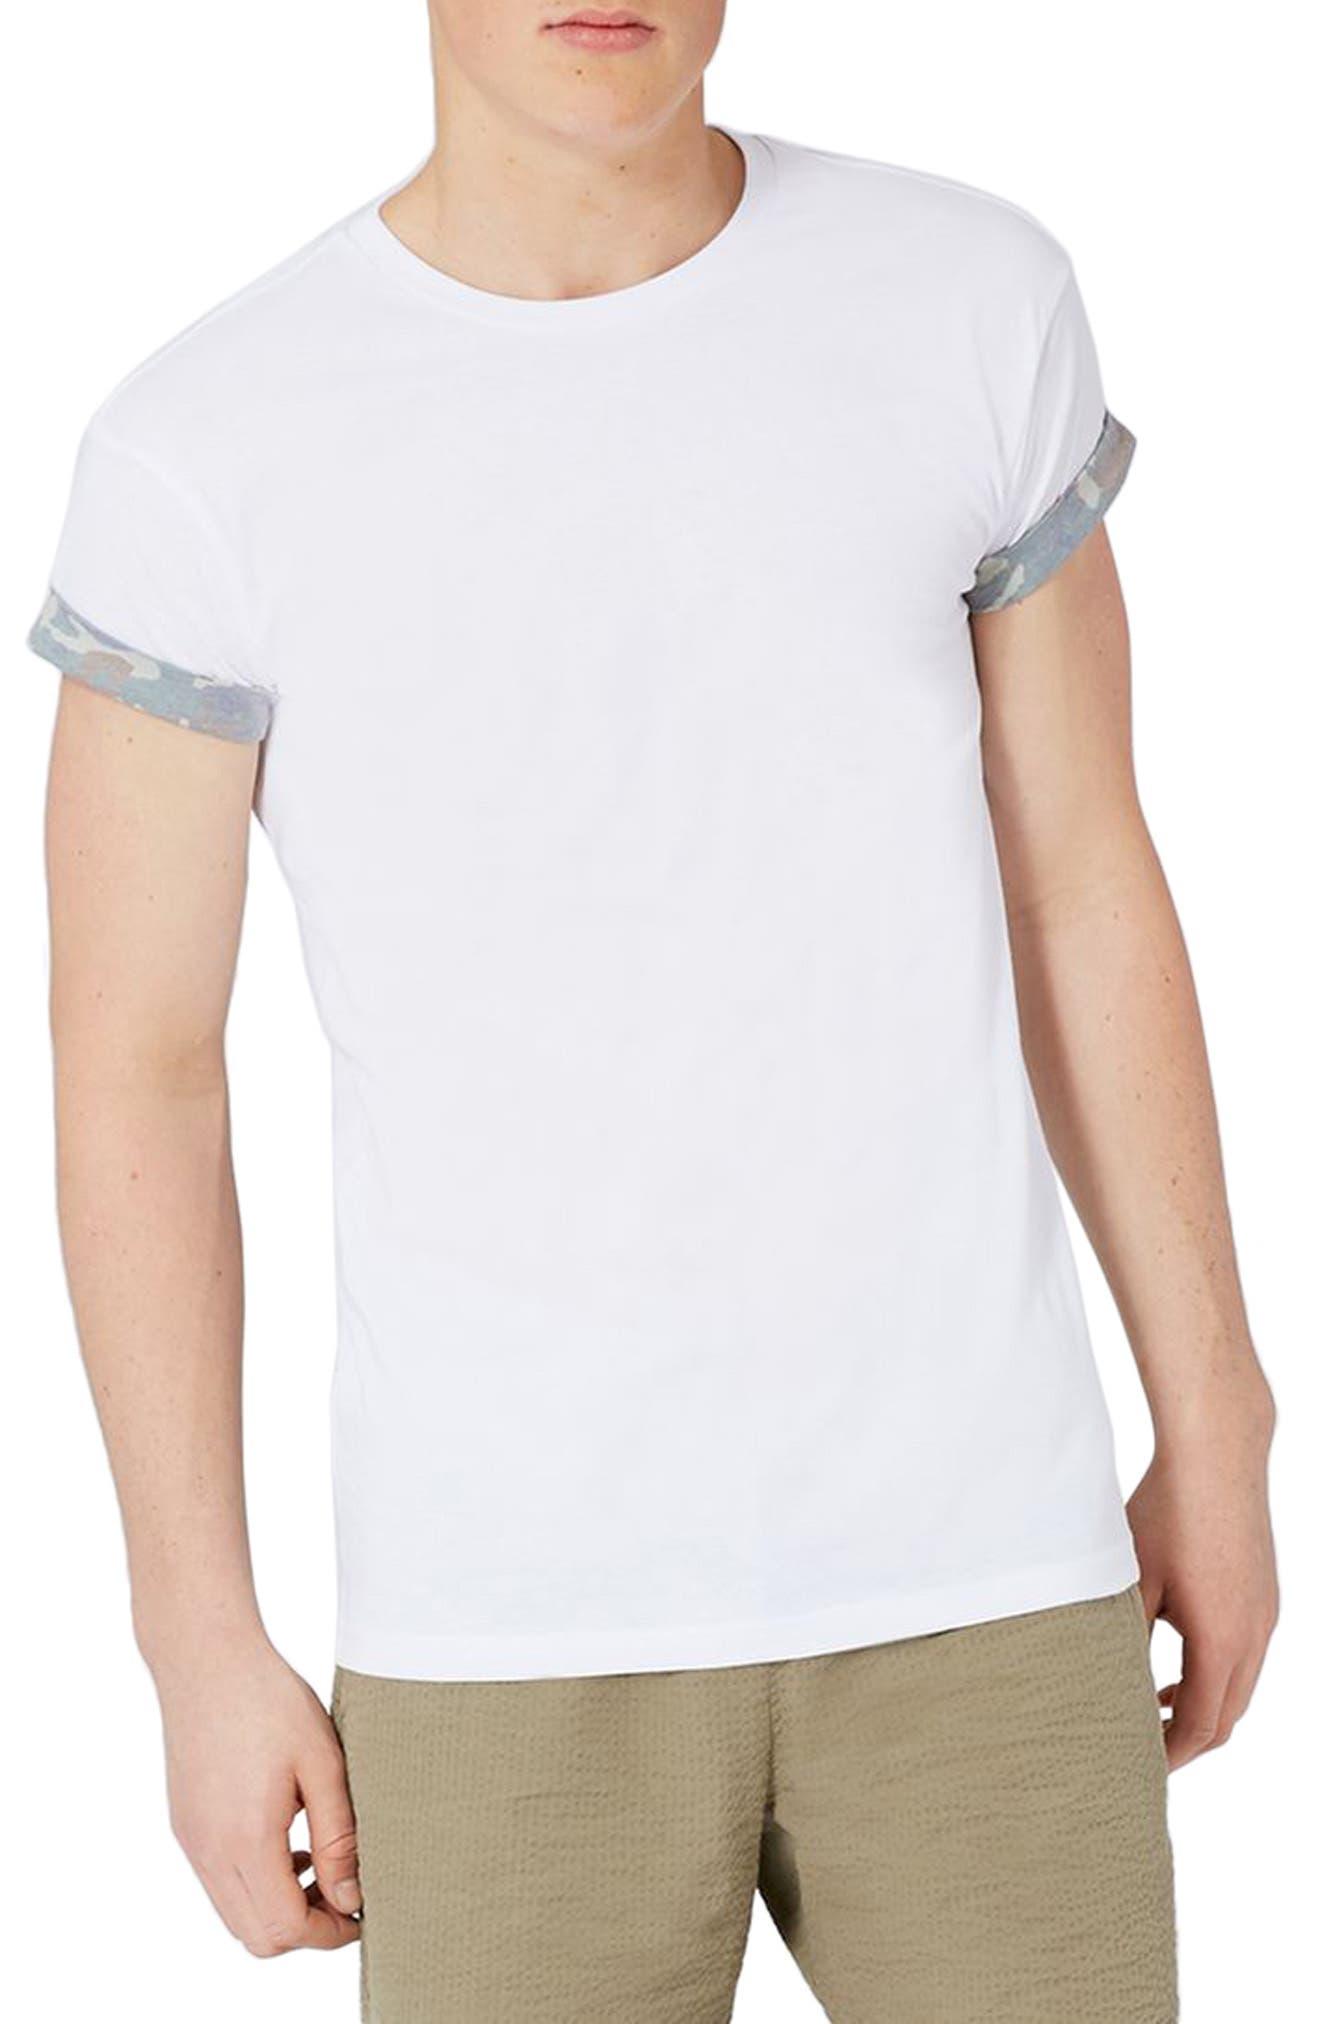 Topman Camo Trim Muscle Fit Roller T-Shirt